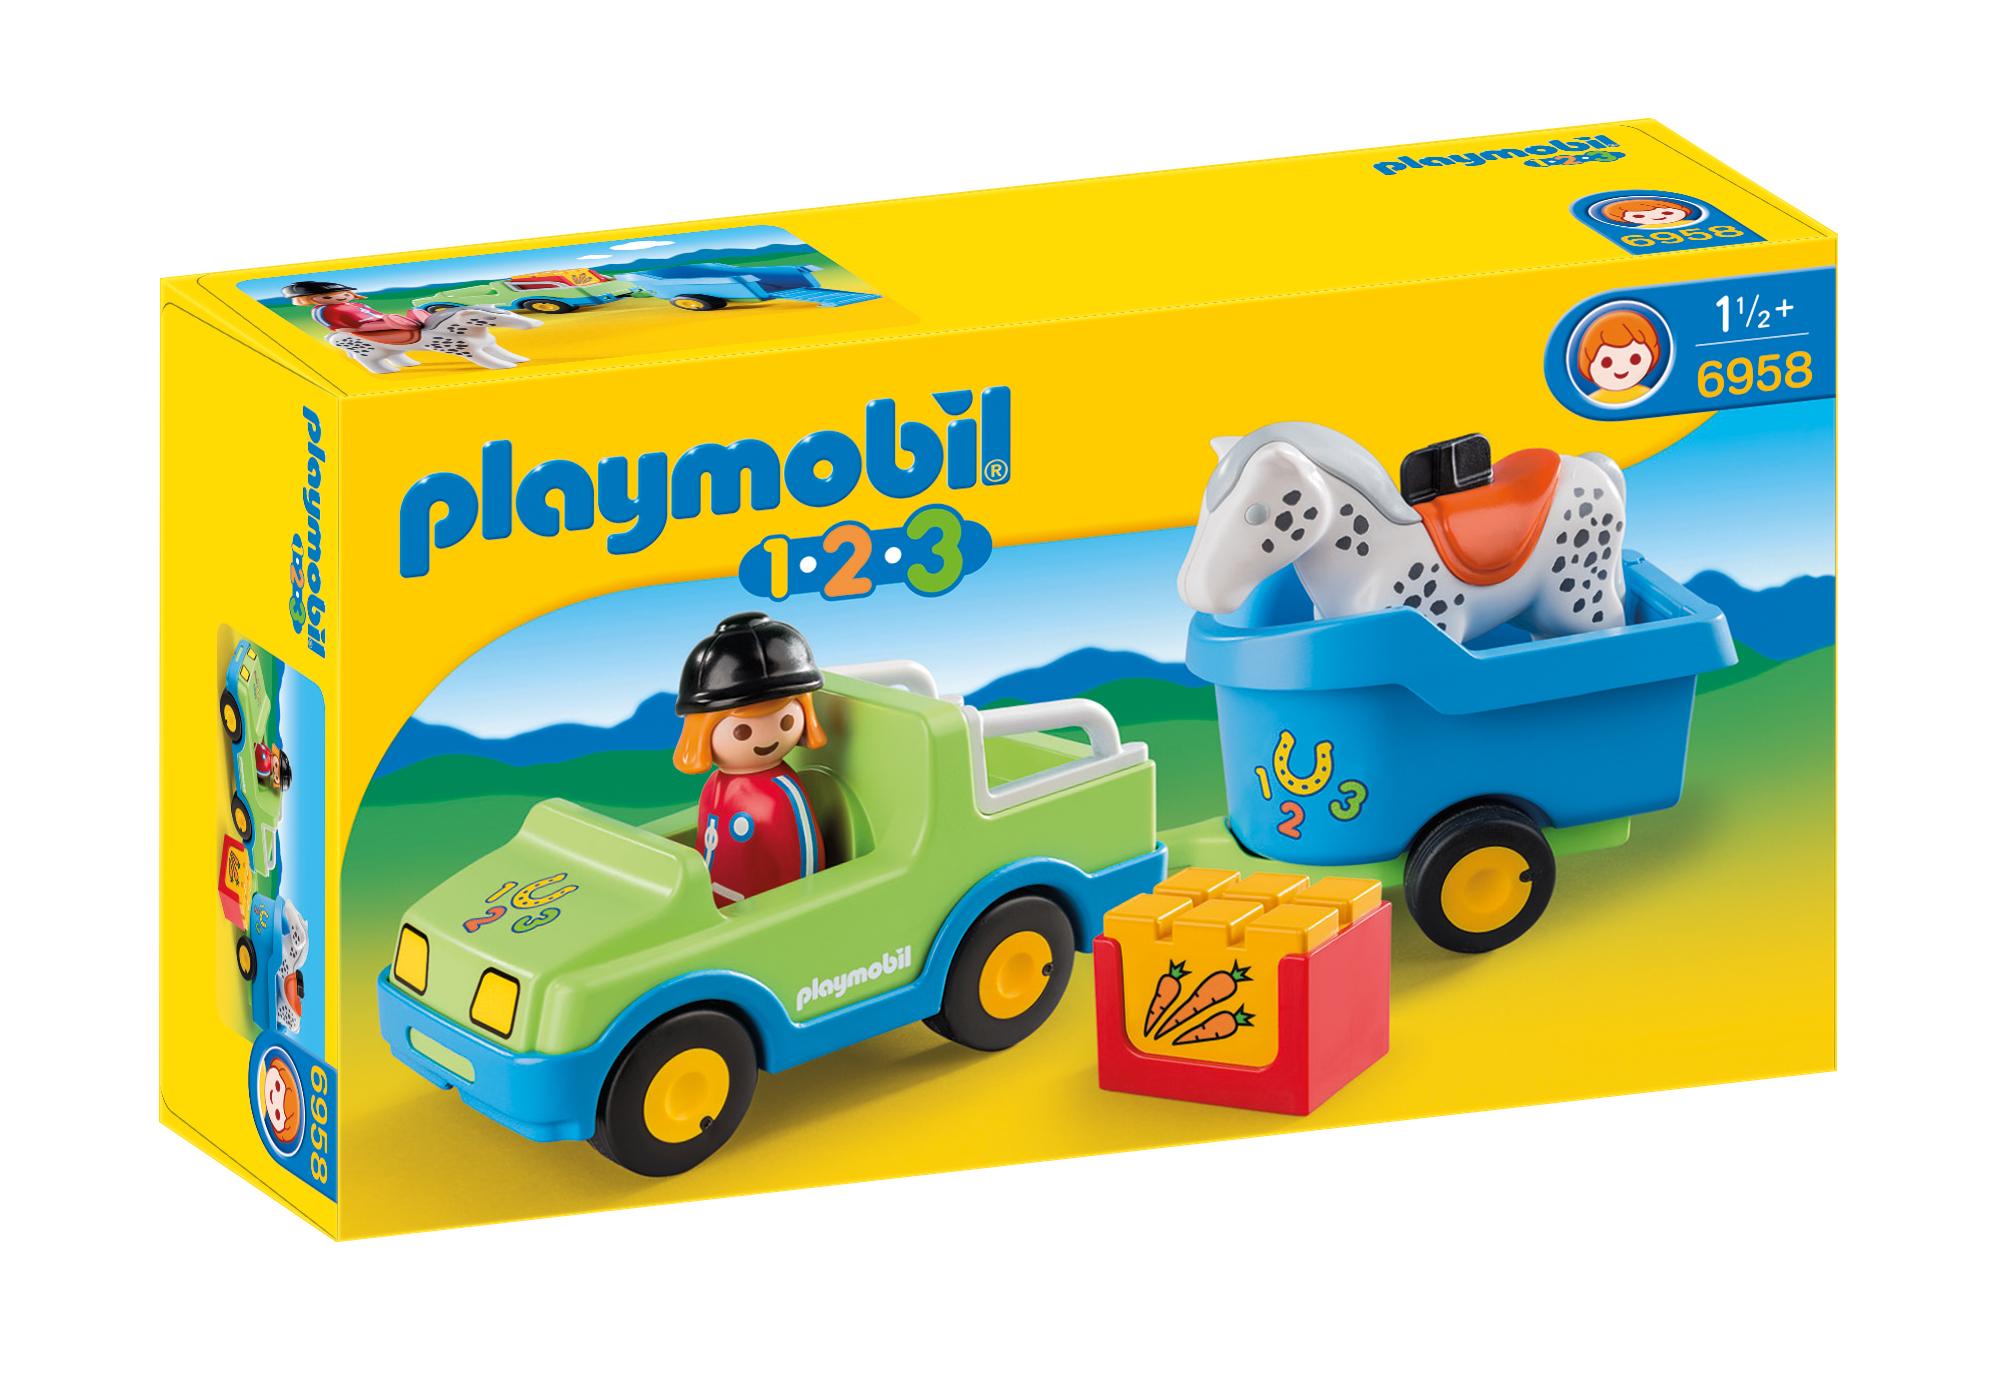 http://media.playmobil.com/i/playmobil/6958_product_box_front/1.2.3 Coche con Remolque